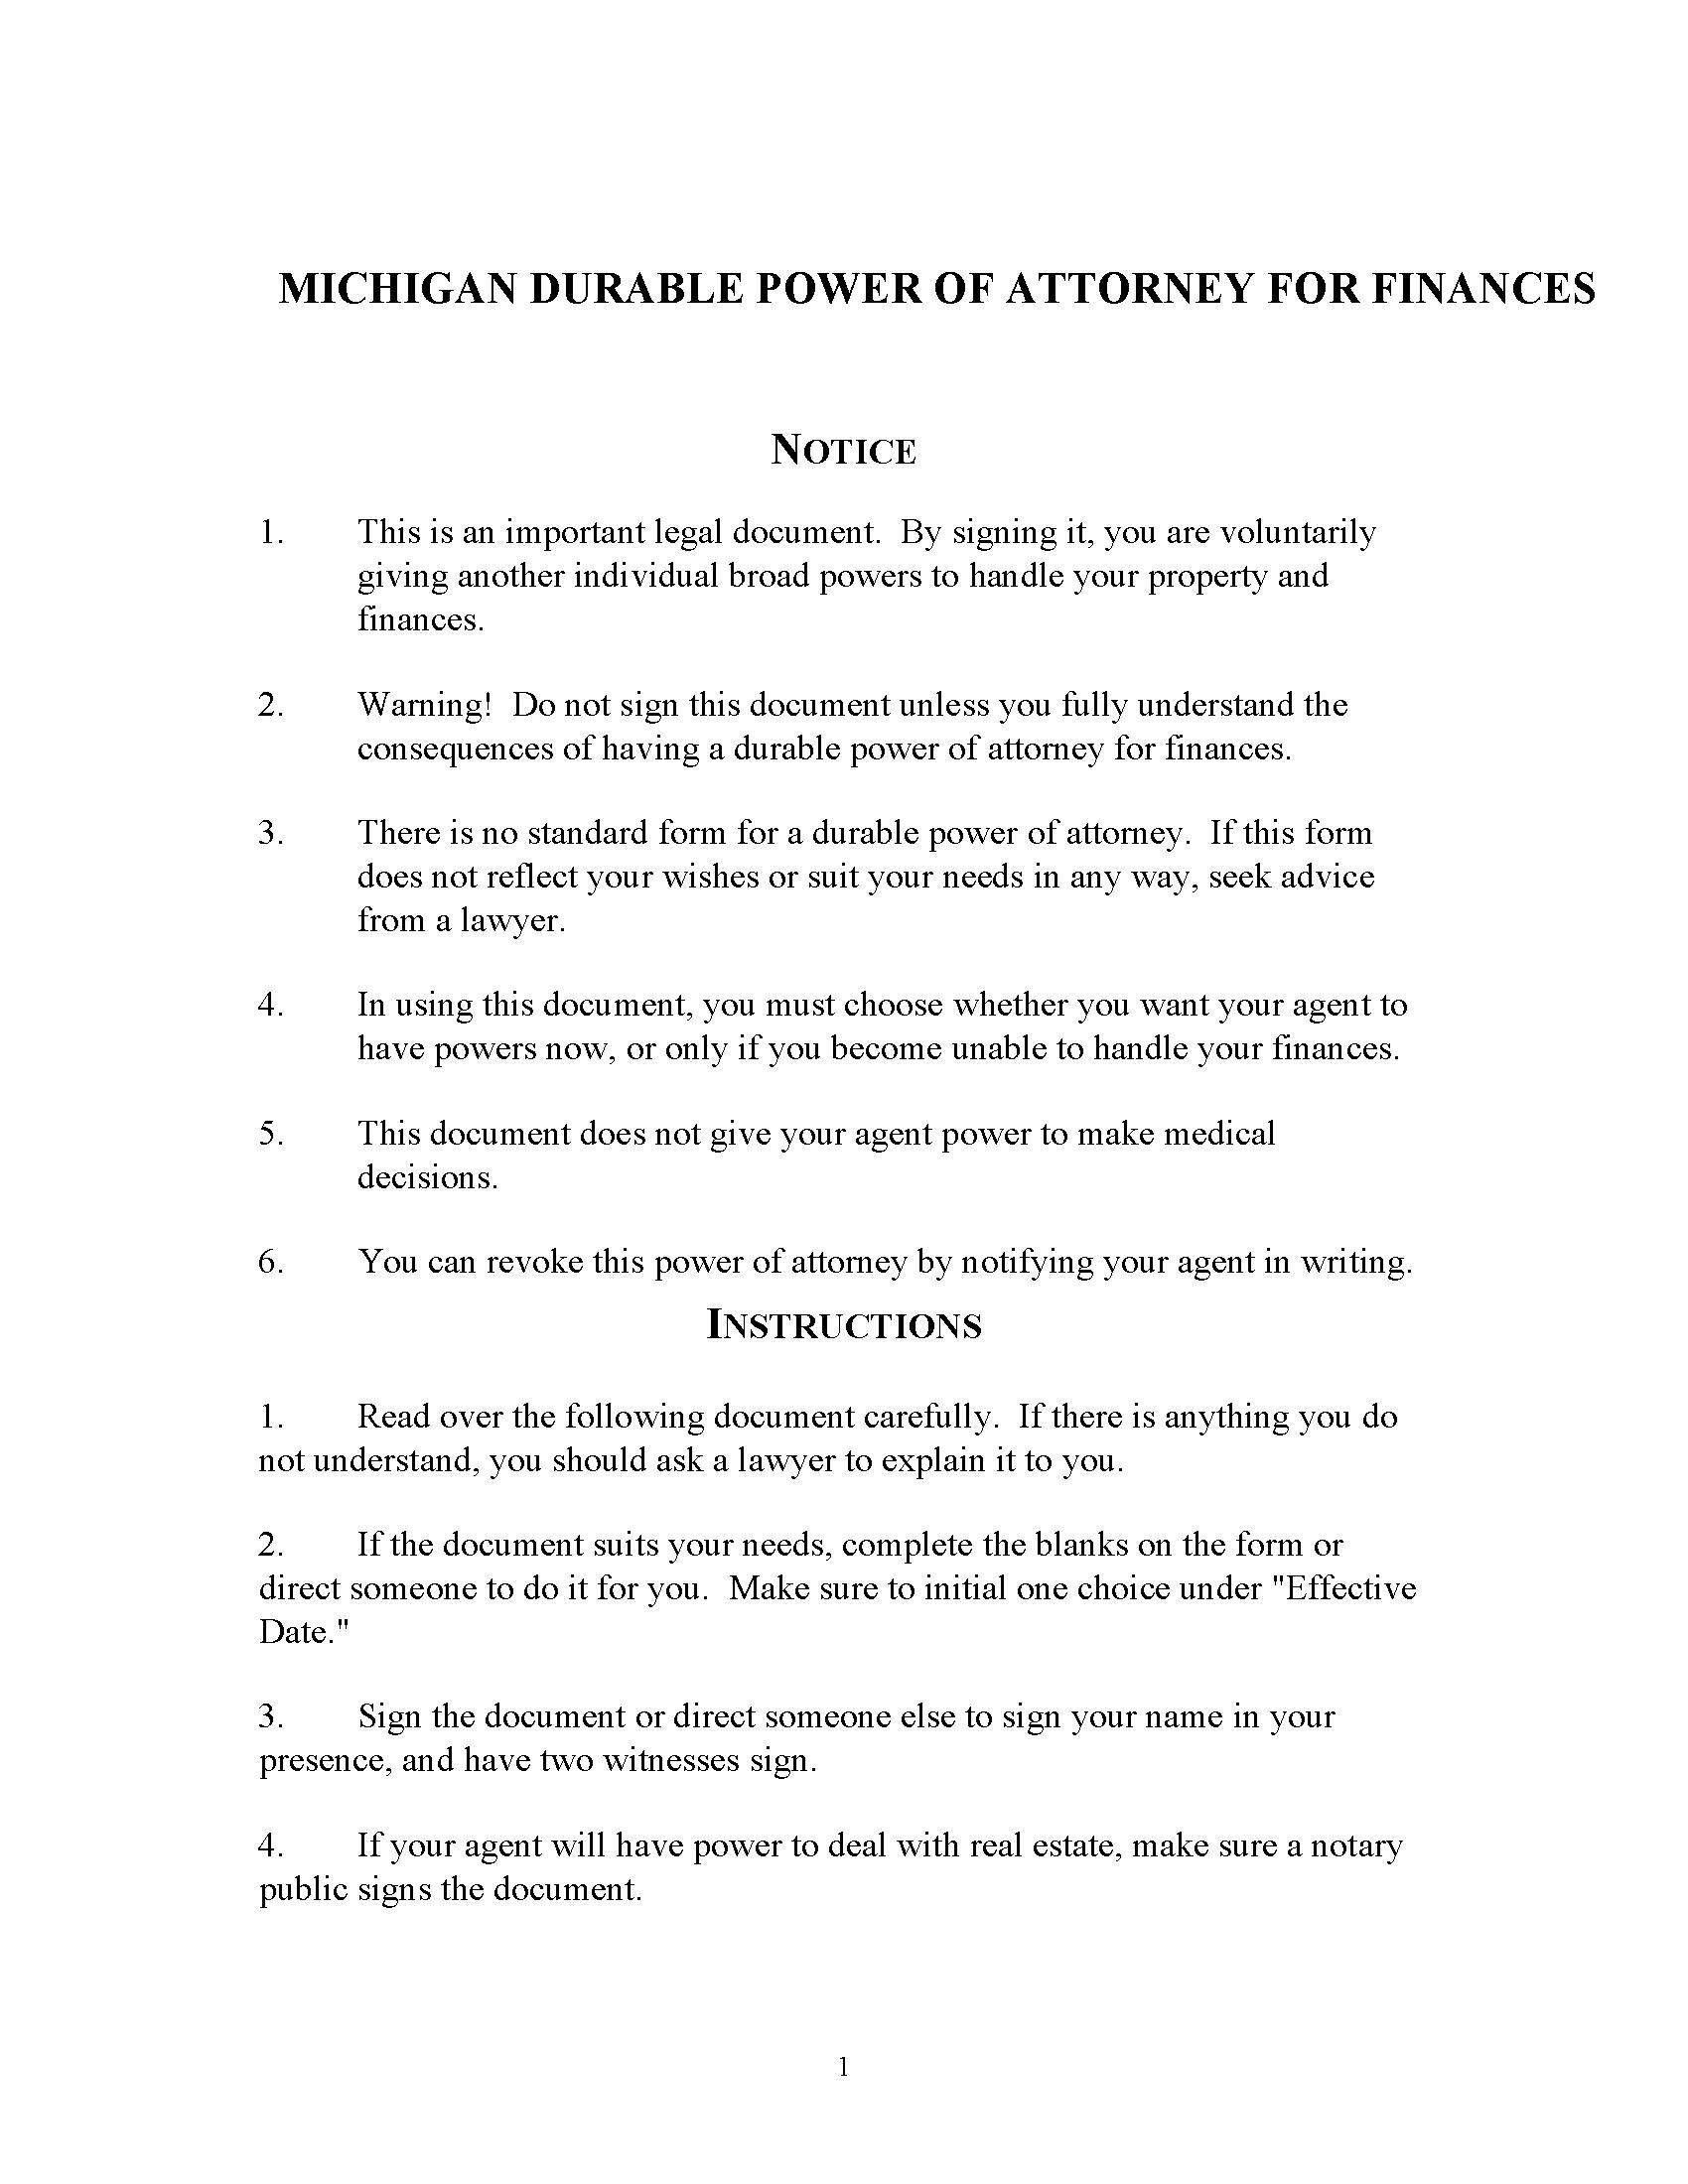 Michigan Financial Power of Attorney Form